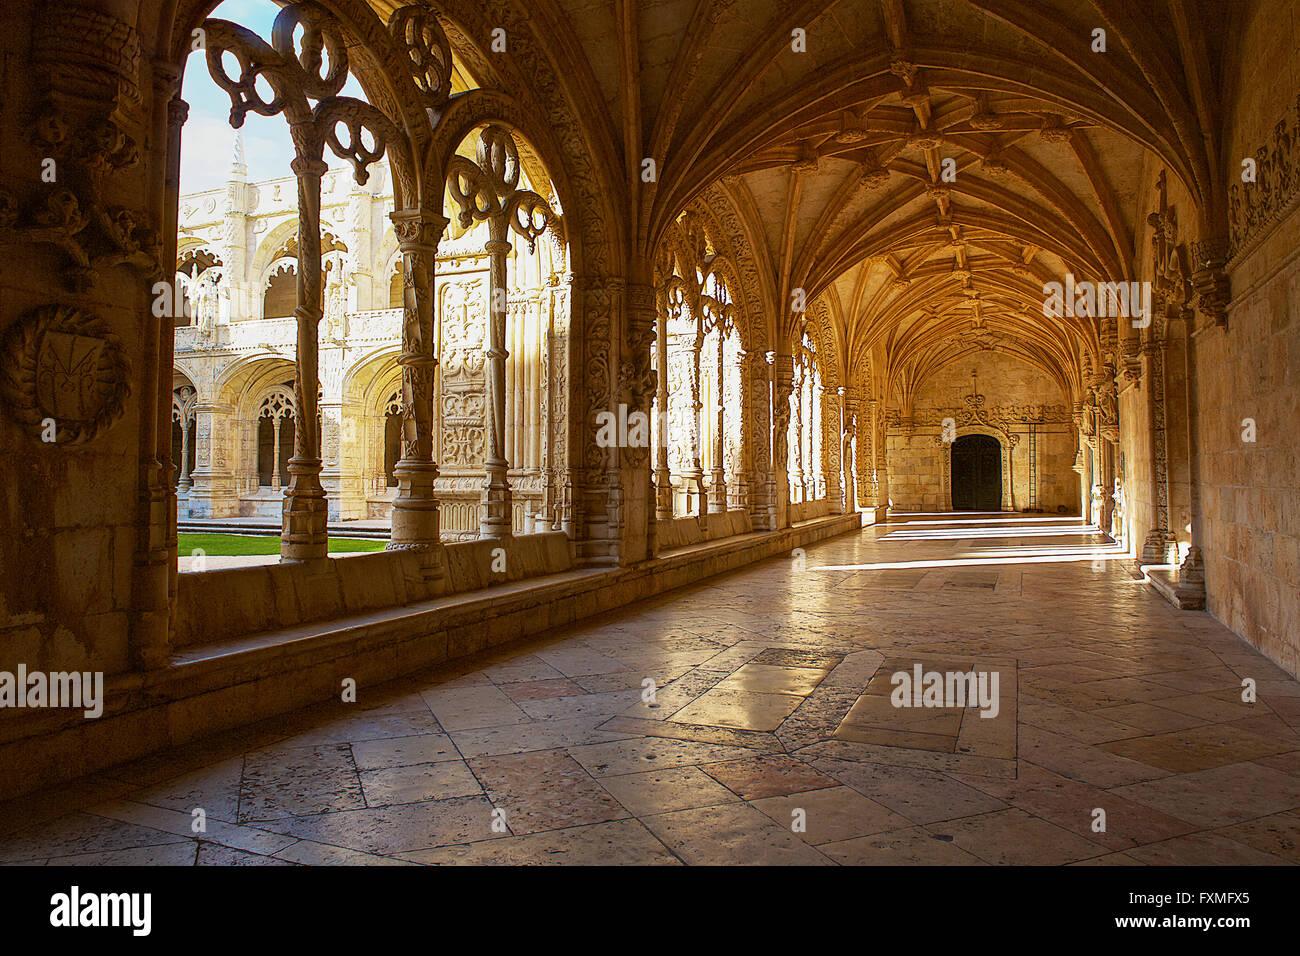 Jerónimos Monastery, Lisbon, Portugal - Stock Image